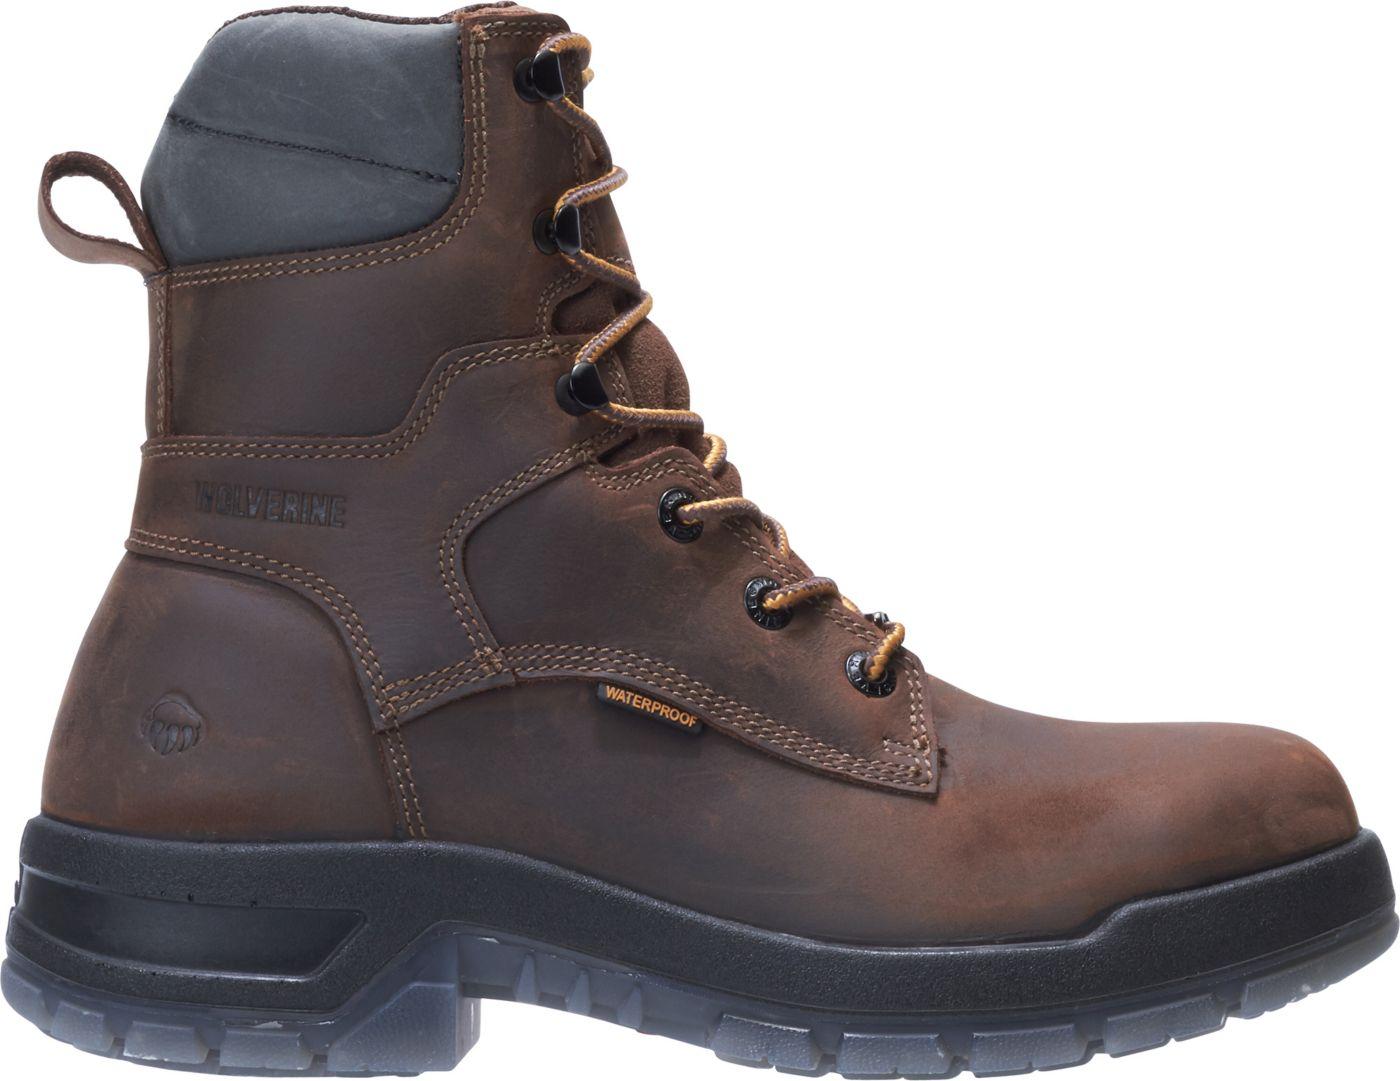 Wolverine Men's Rampart USA 8'' Waterproof Composite Toe Work Boots